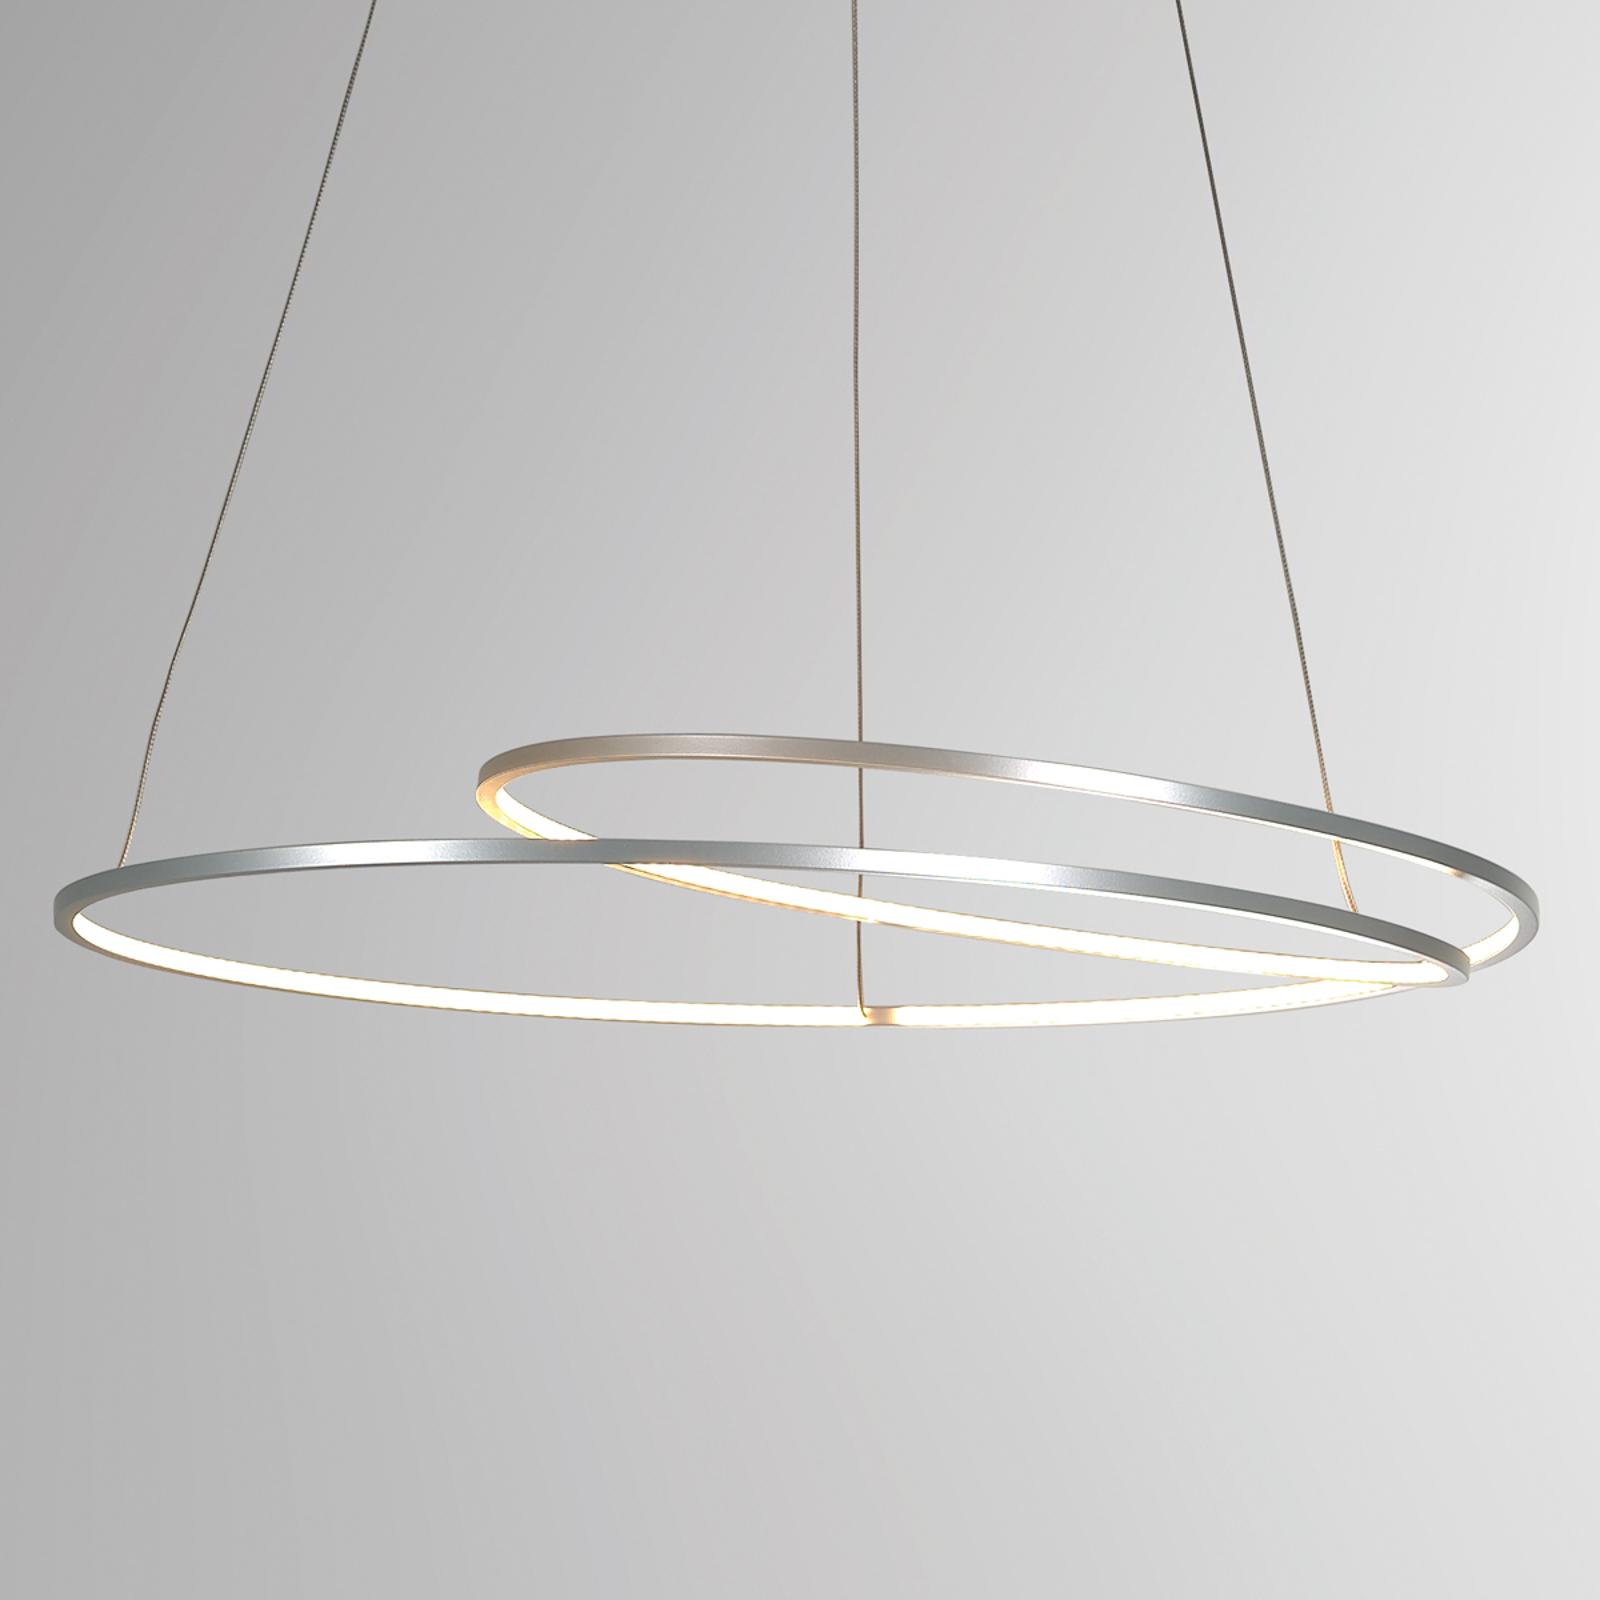 Lámpara colgante LED Arroba afiligranada atenuable